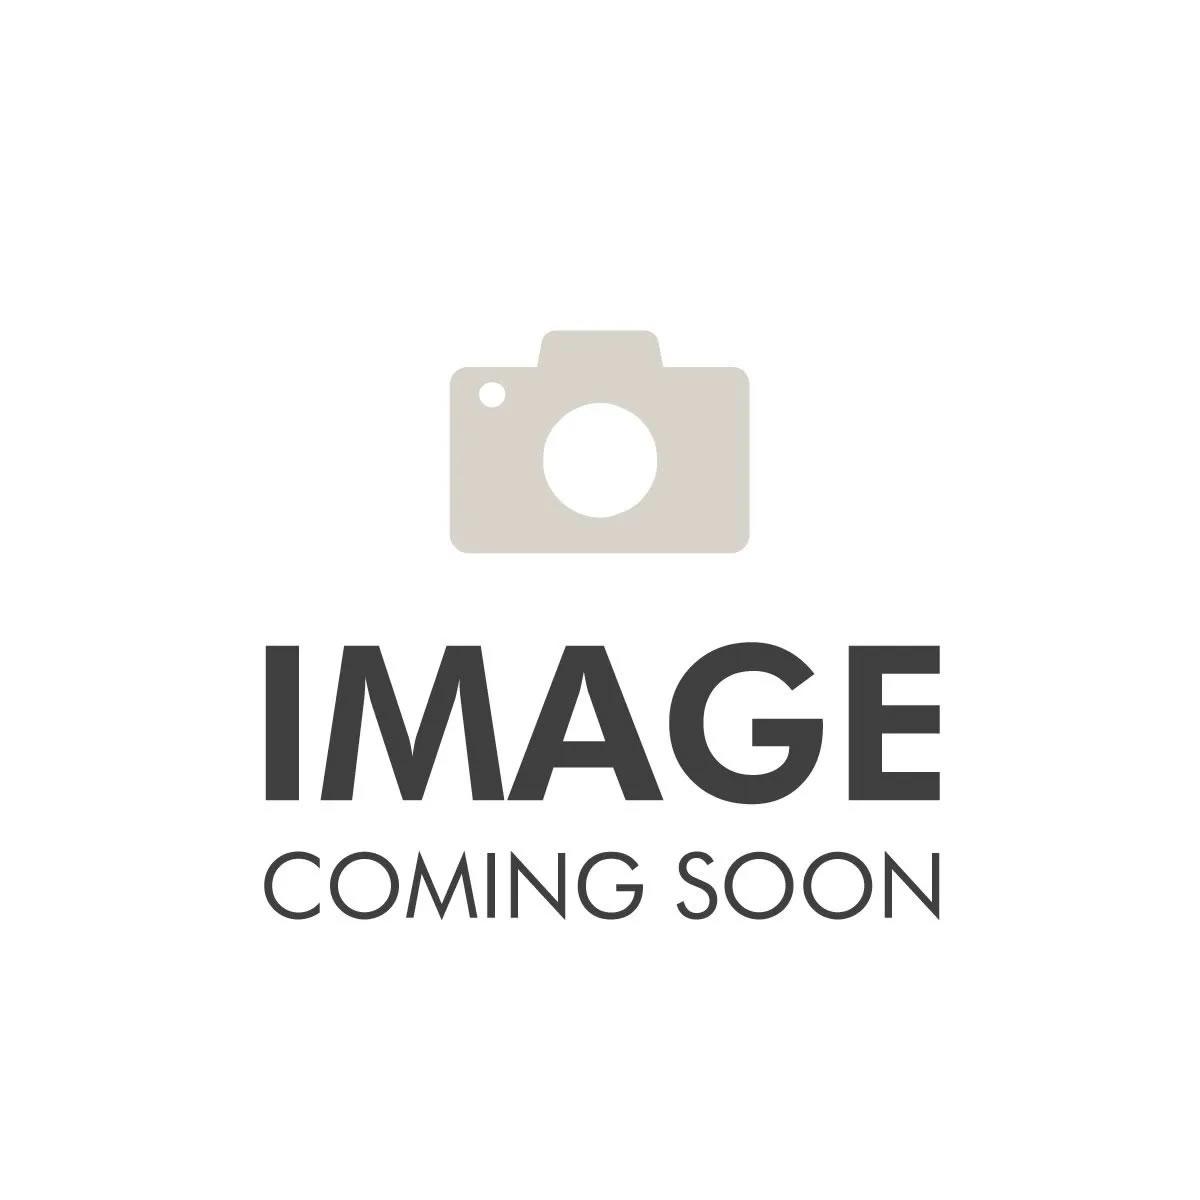 Defender Front Bumper Stainless Steel 55-06 Jeep CJ/Wrangler